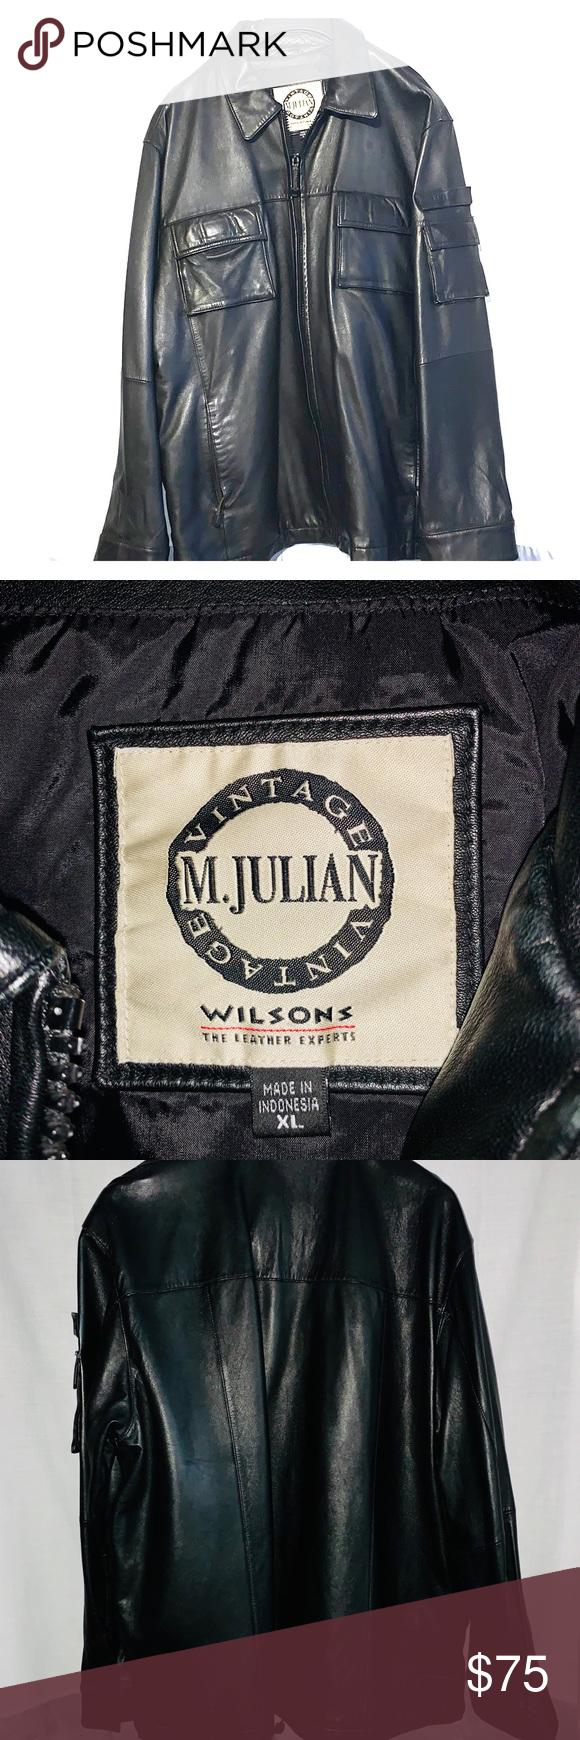 Mens Xl M Julian Leather Jacket Like New Leather Jacket Wilsons Leather Jacket Mens Xl